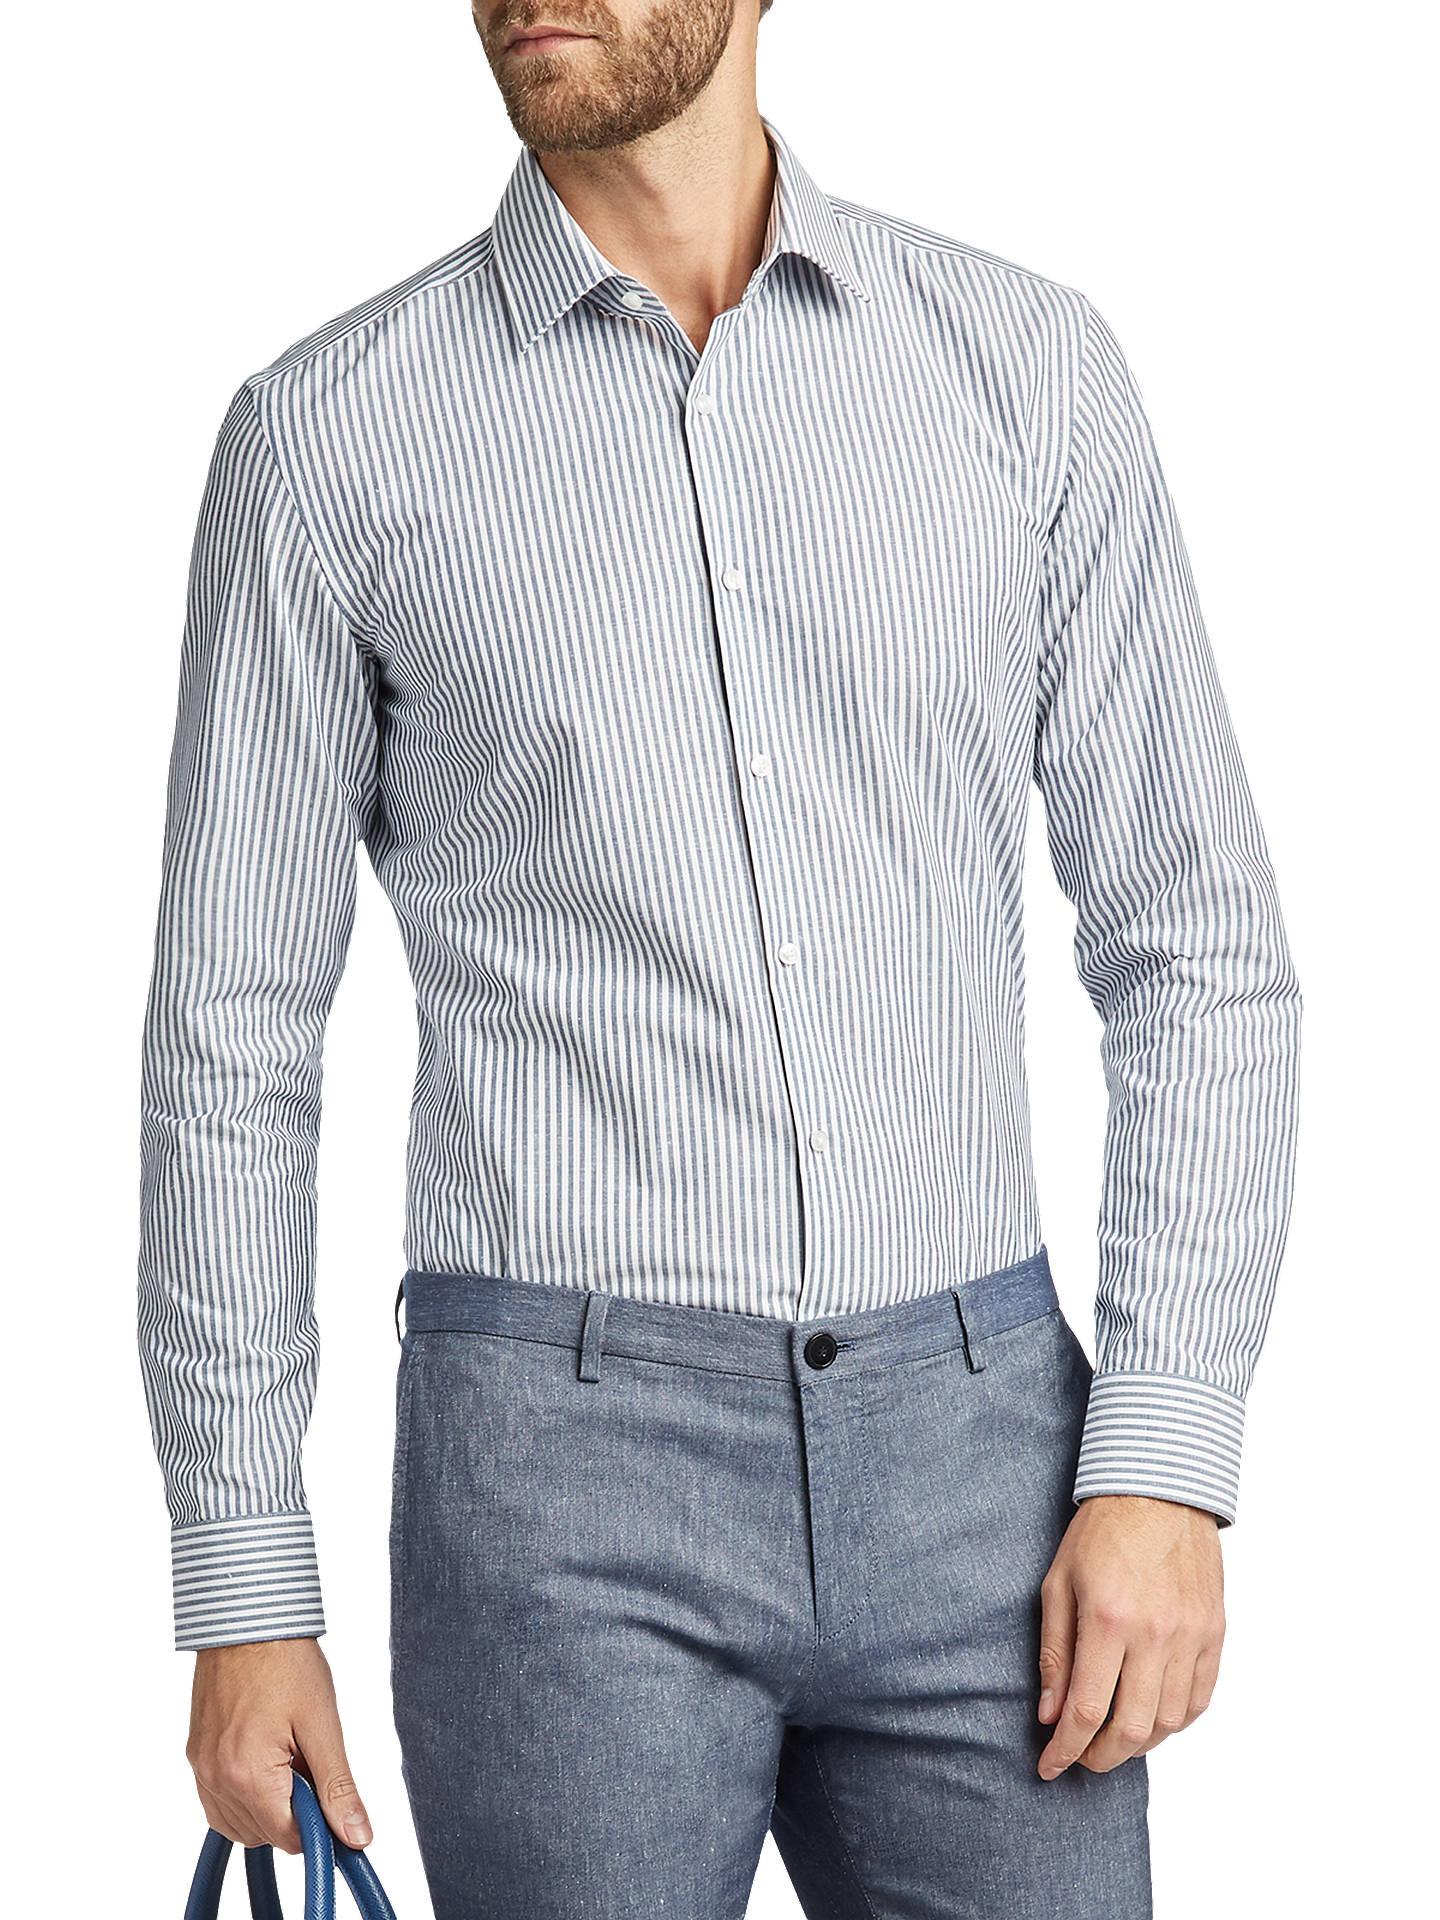 dbd220d16 HUGO by Hugo Boss C-Jenno Stripe Slim Fit Shirt, Navy at John Lewis ...